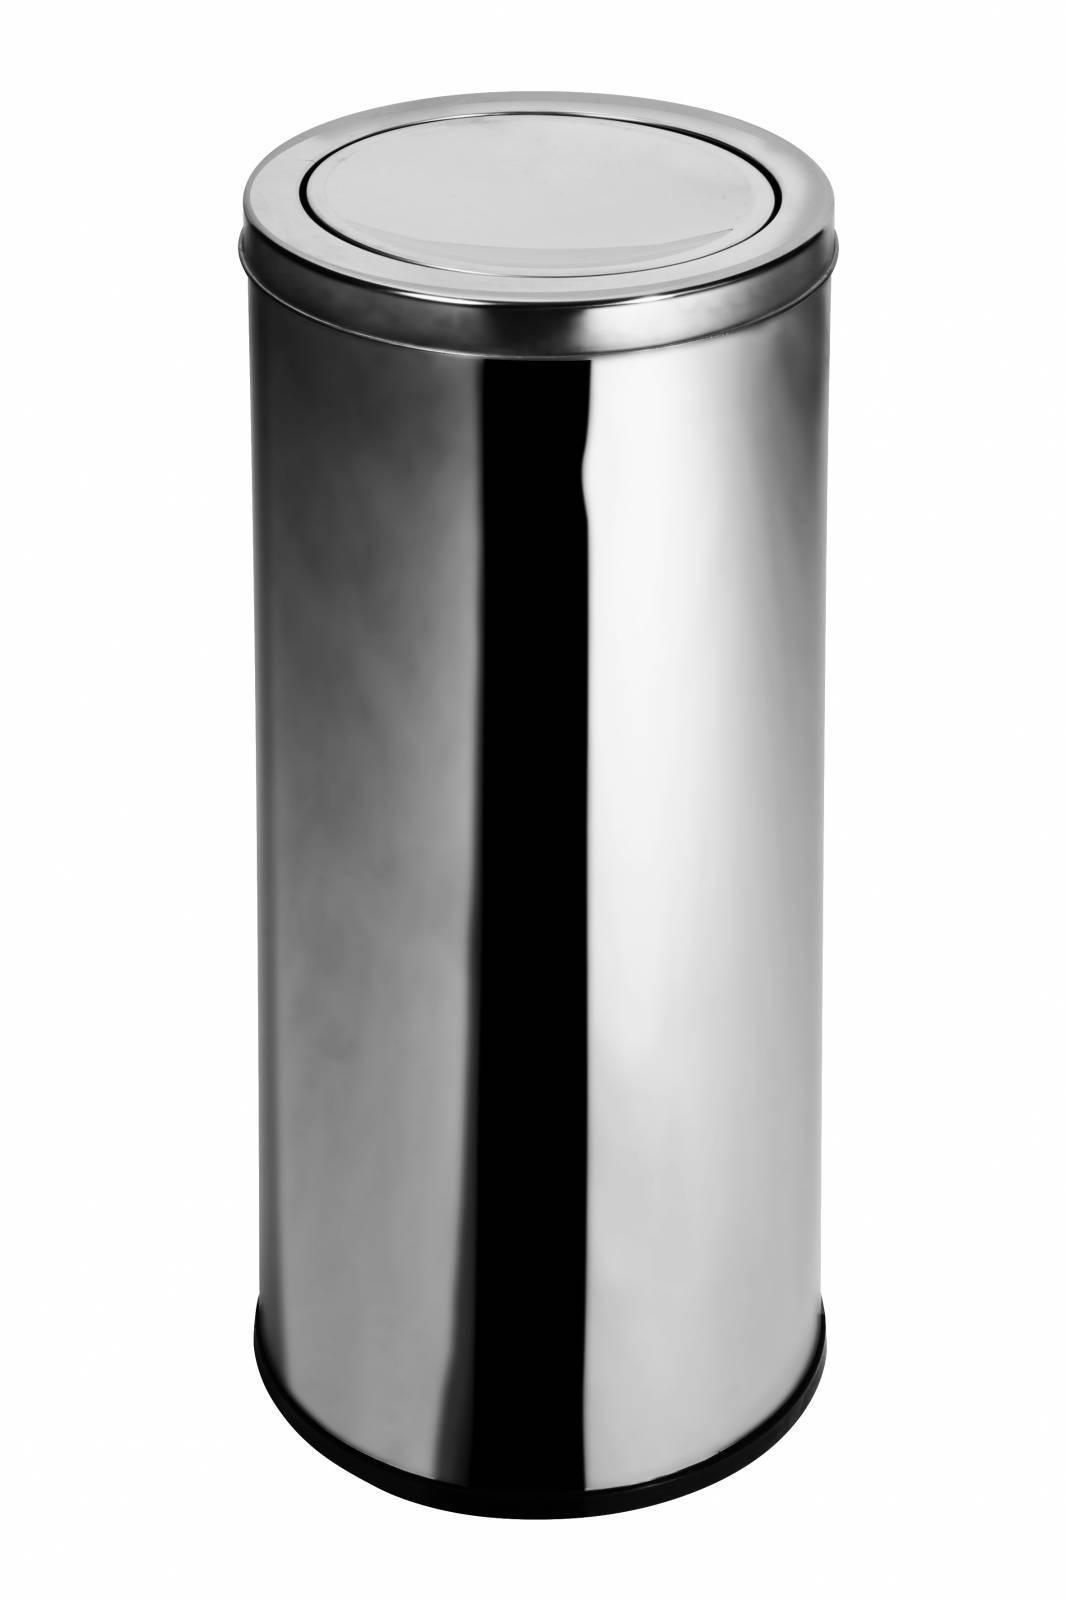 Lixeira Inox c/ tampa Basculante 22 - Litros Elegance